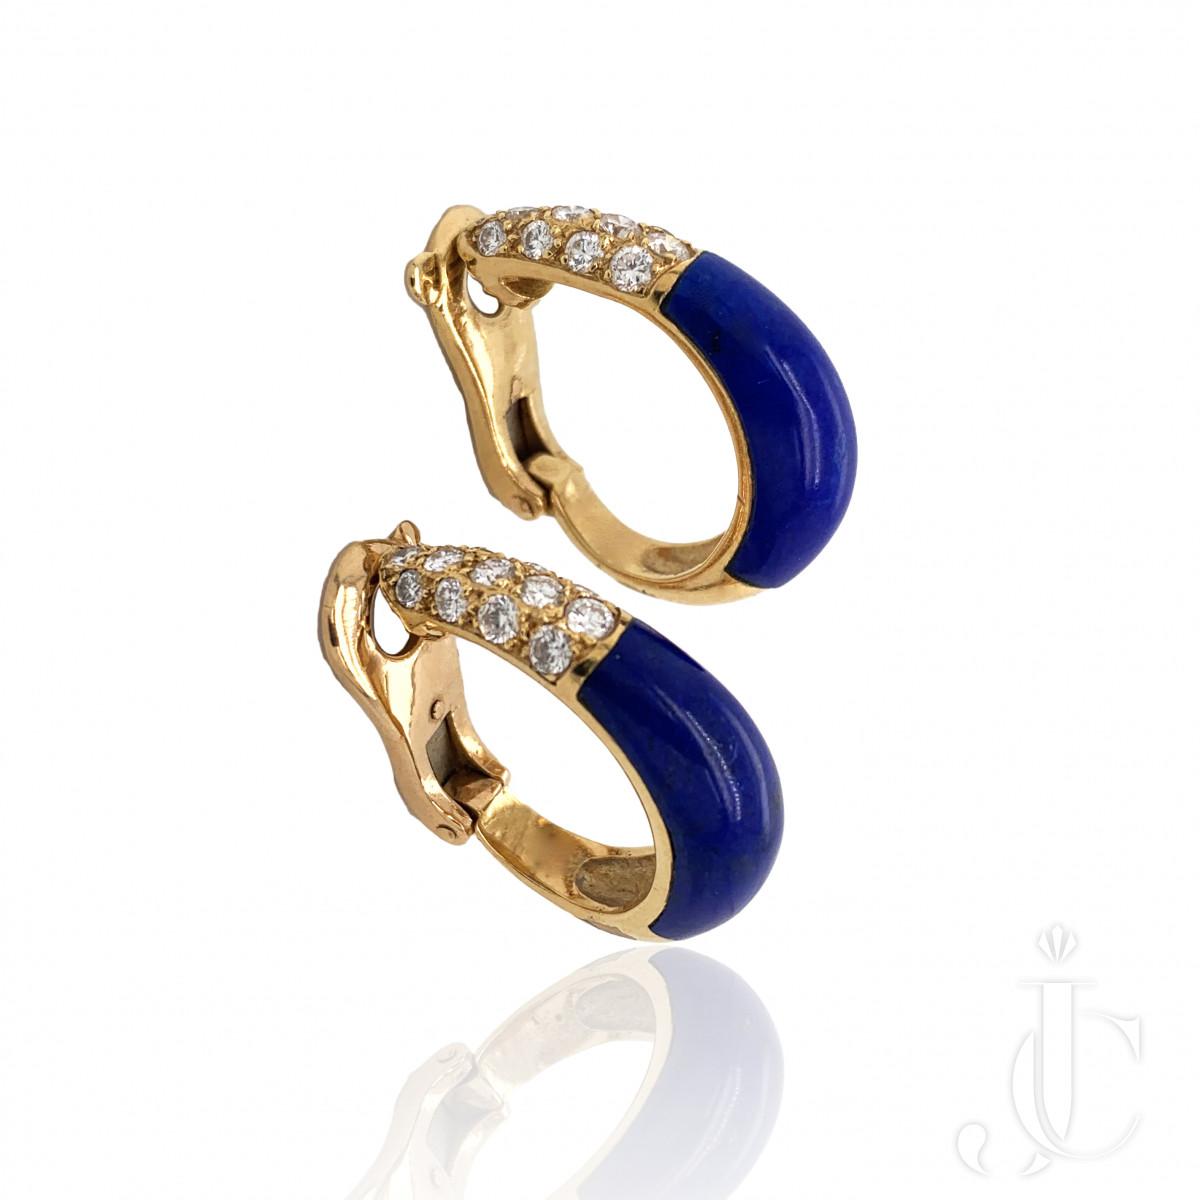 Cartier French 1980s 18kt Gold Diamond & Lapis Earrings